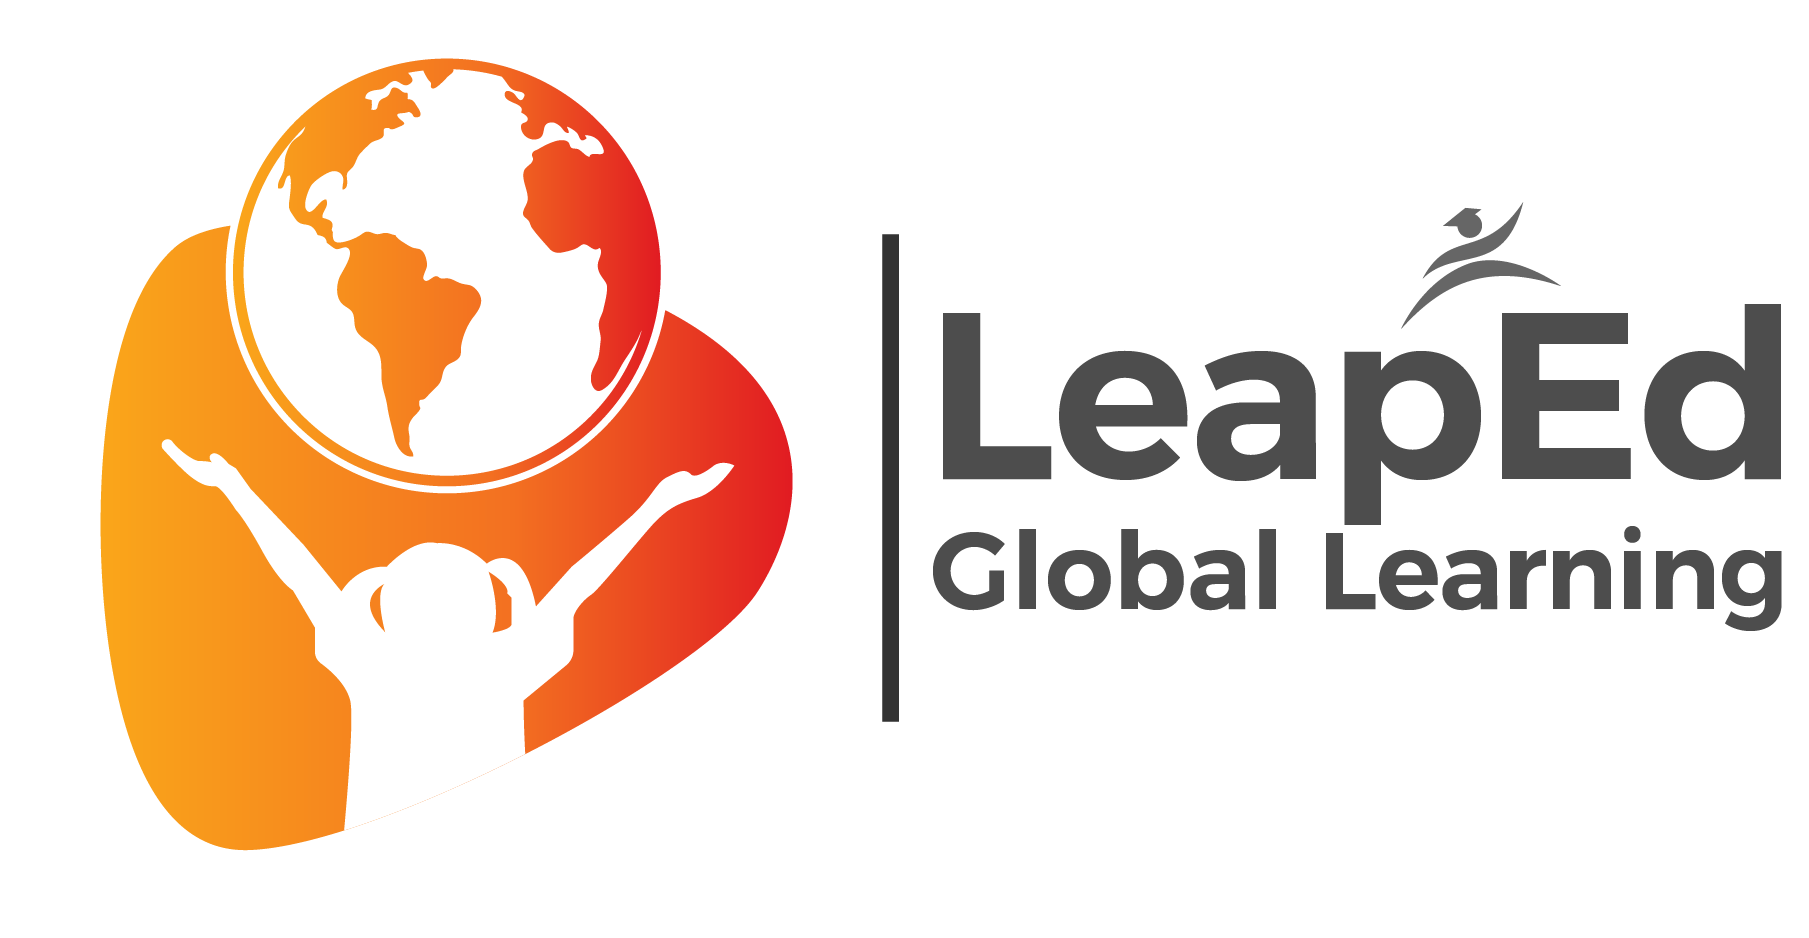 LeadEd Global Learning